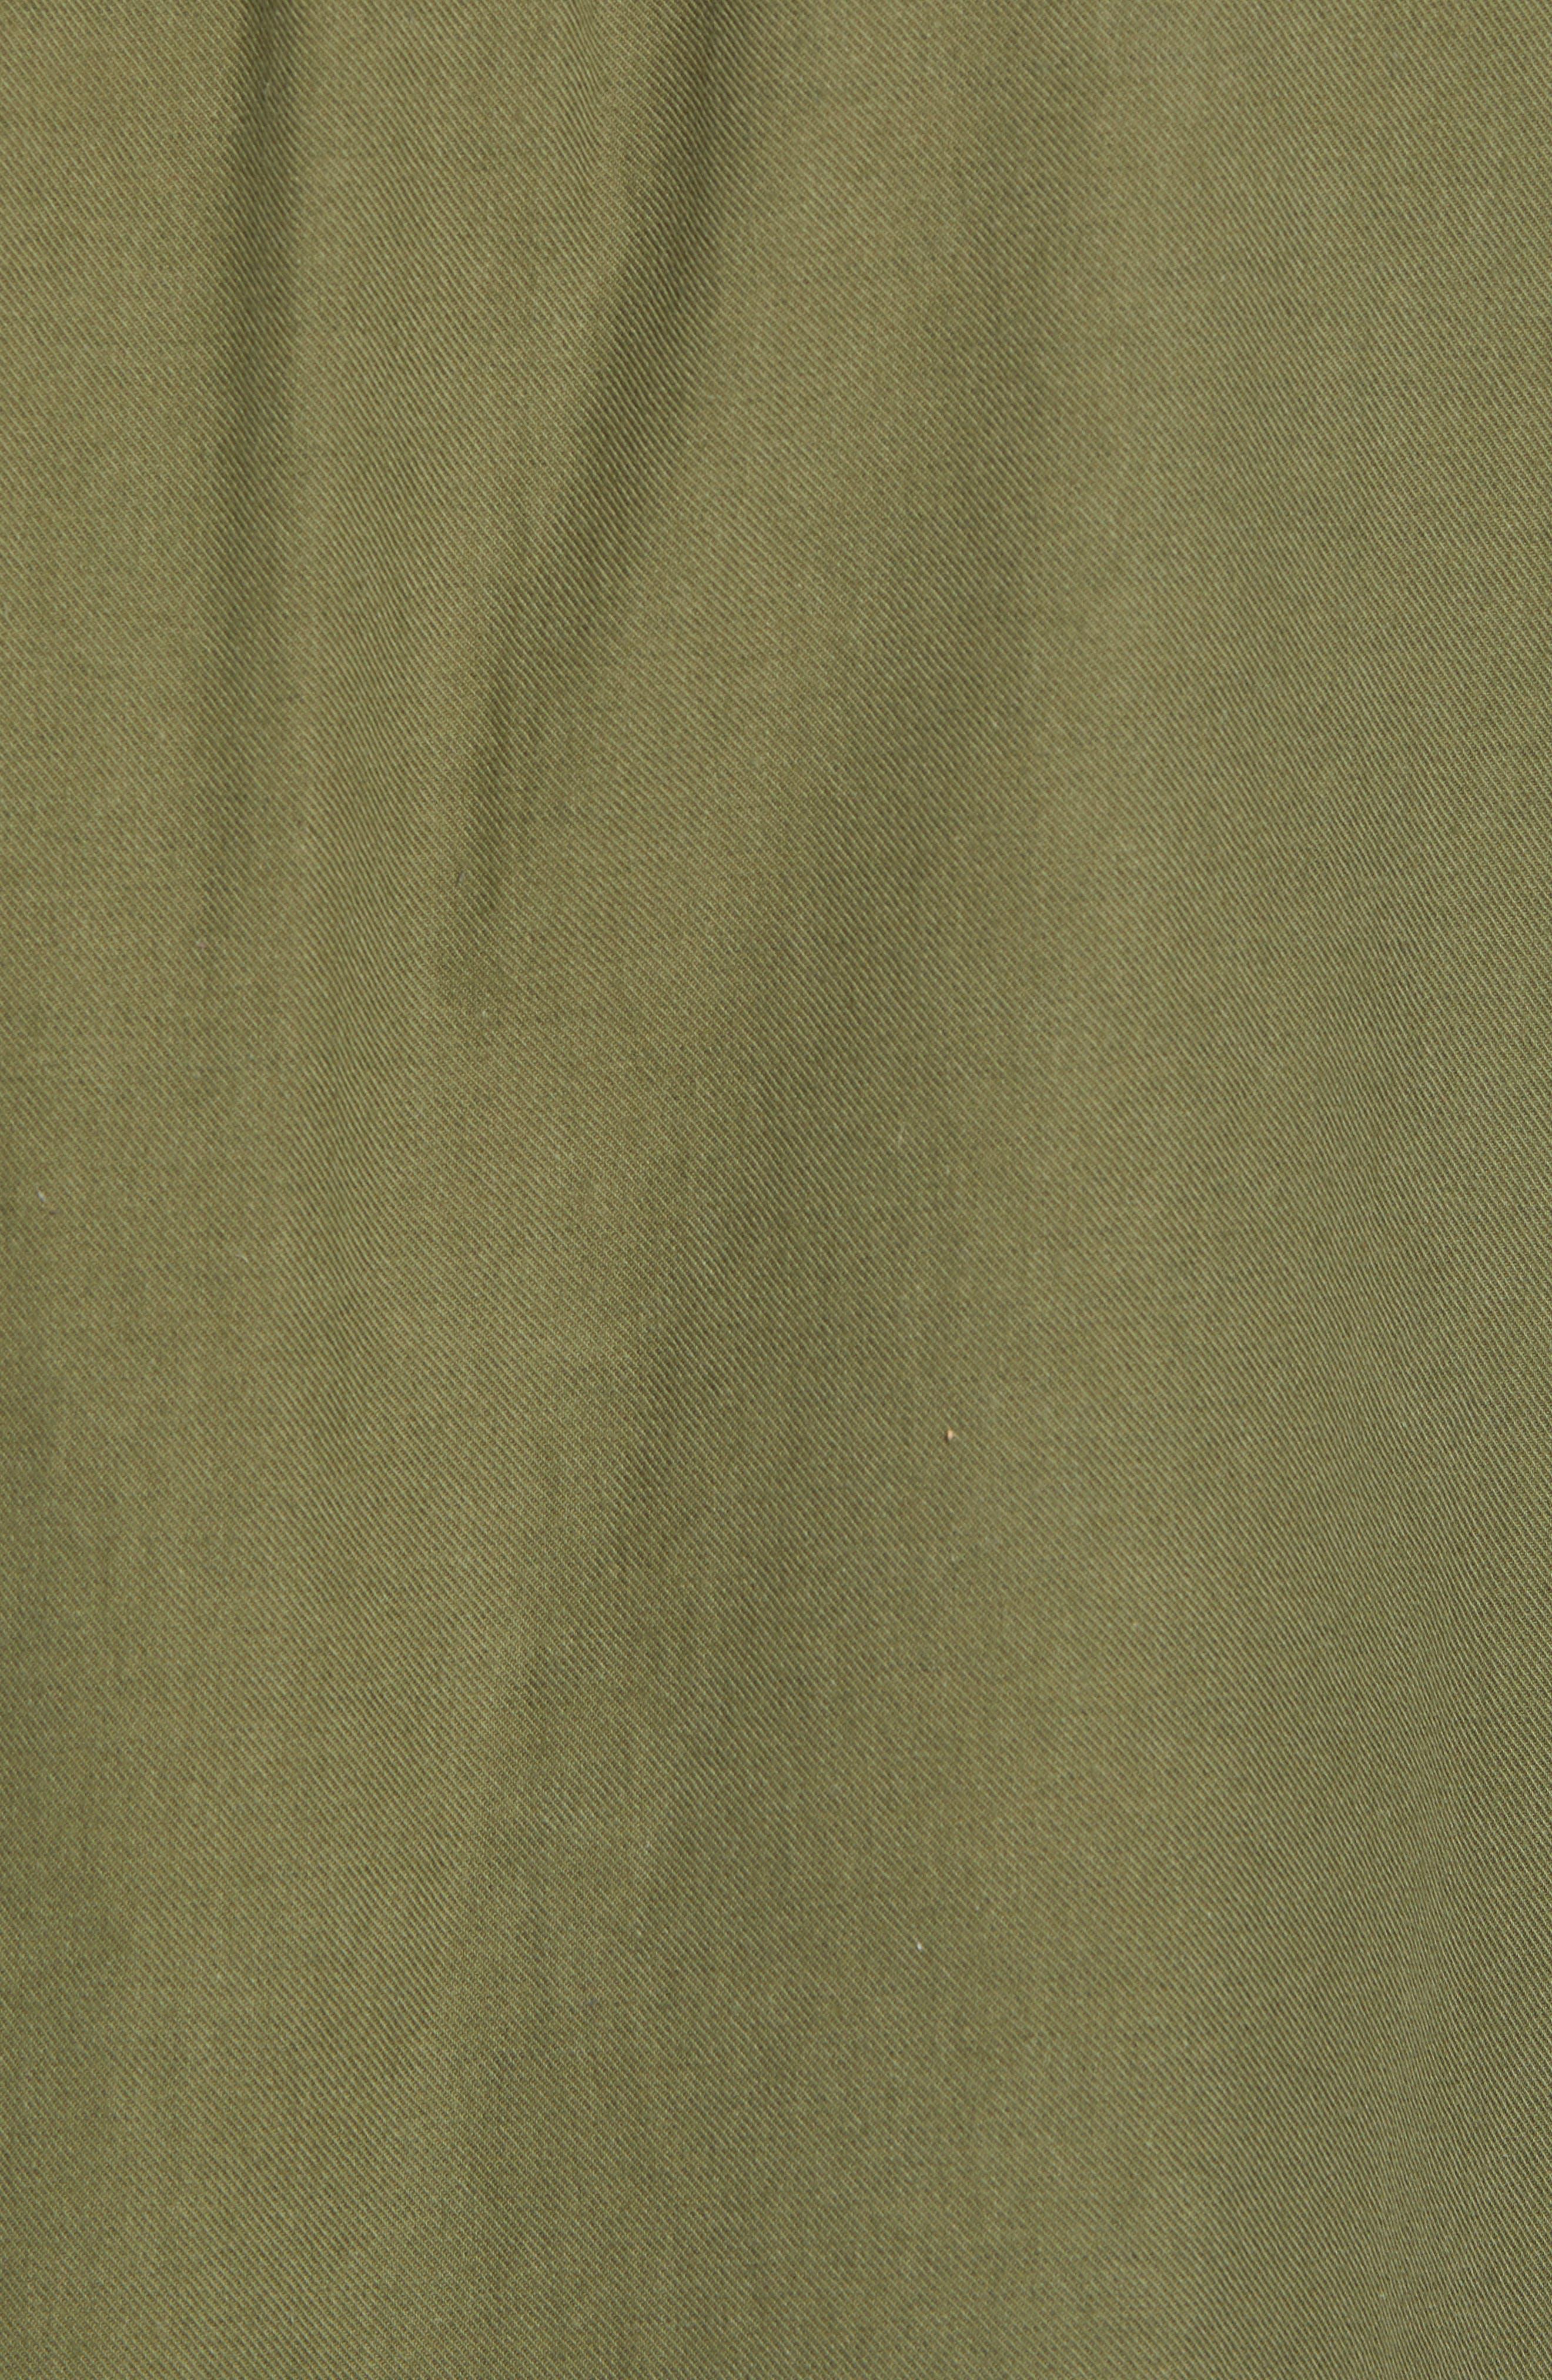 rag + bone Jack Slim Fit Plaid Sport Shirt,                             Alternate thumbnail 5, color,                             315